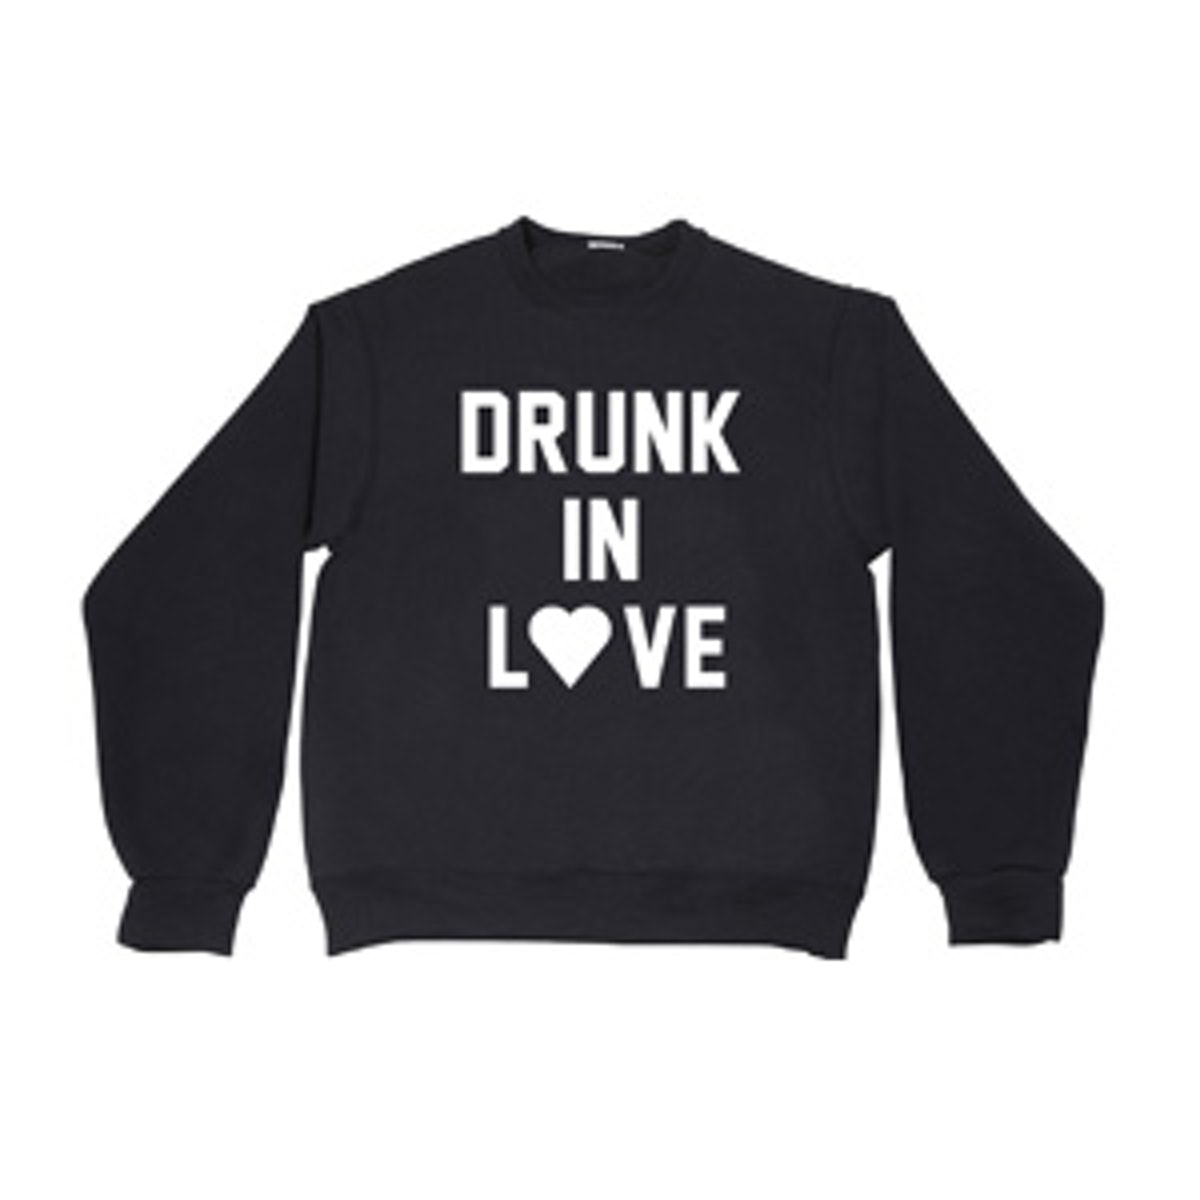 Drunk In Love Sweatshirt